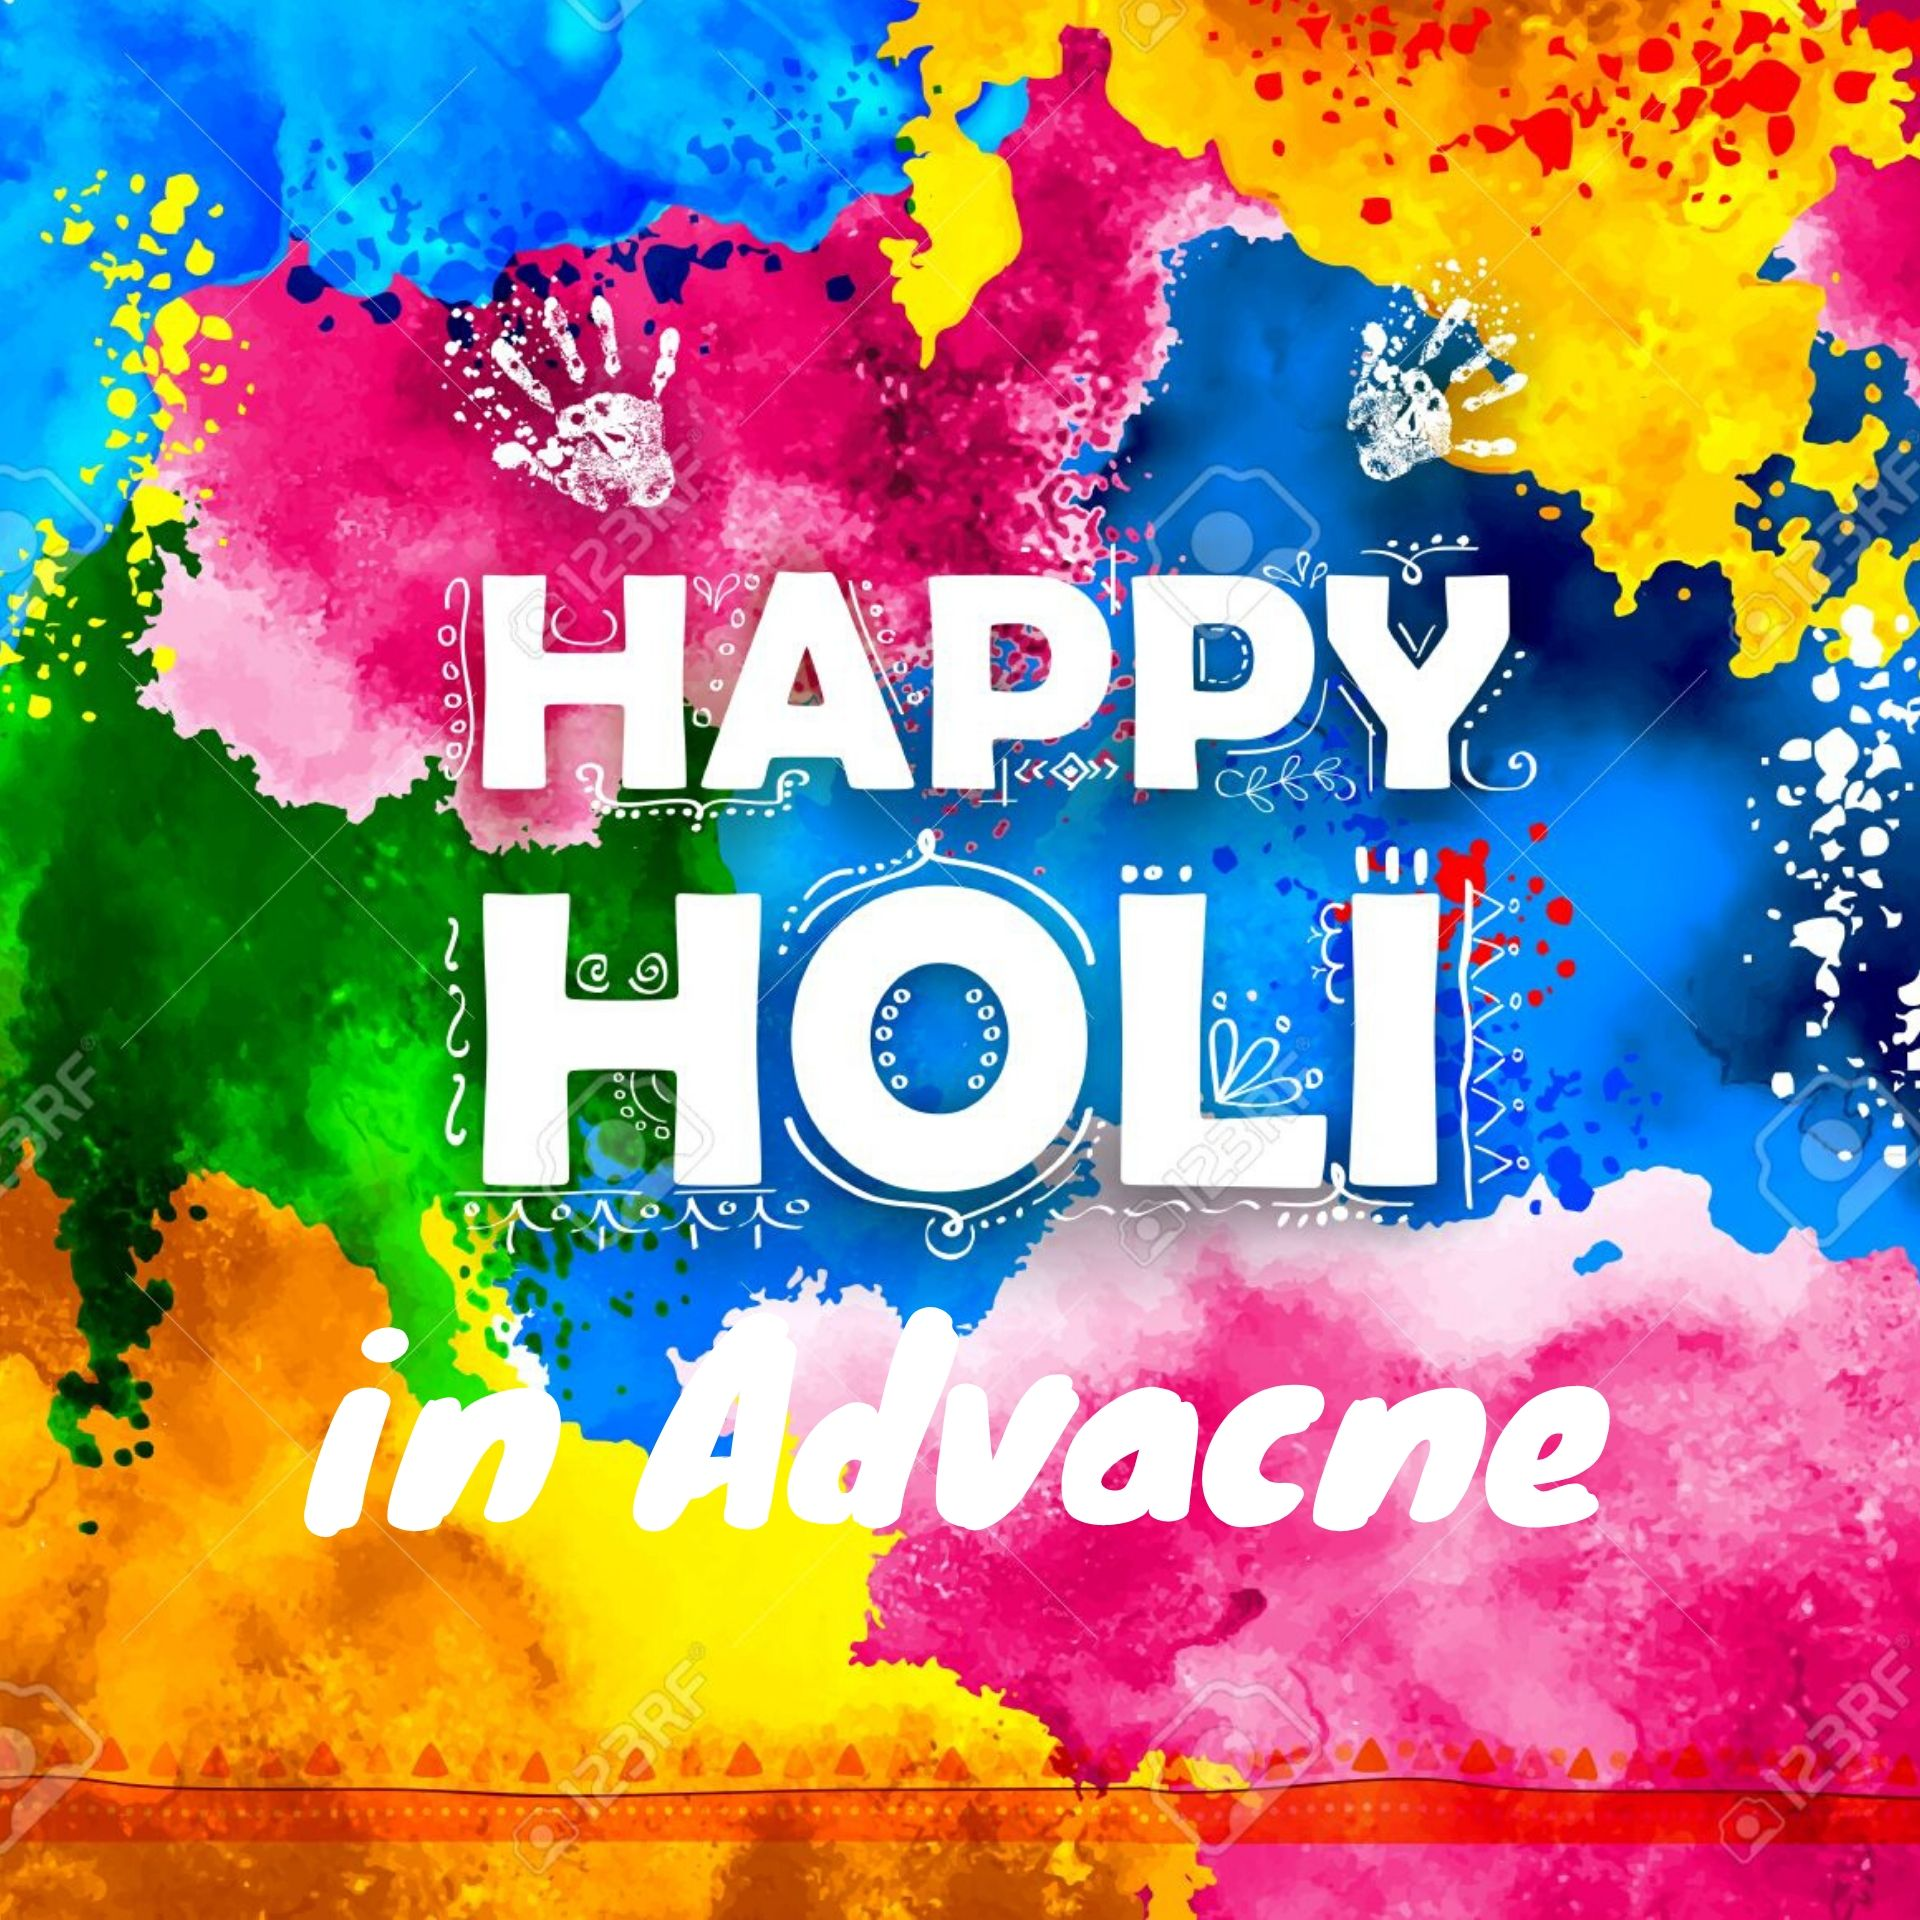 advance happy holi